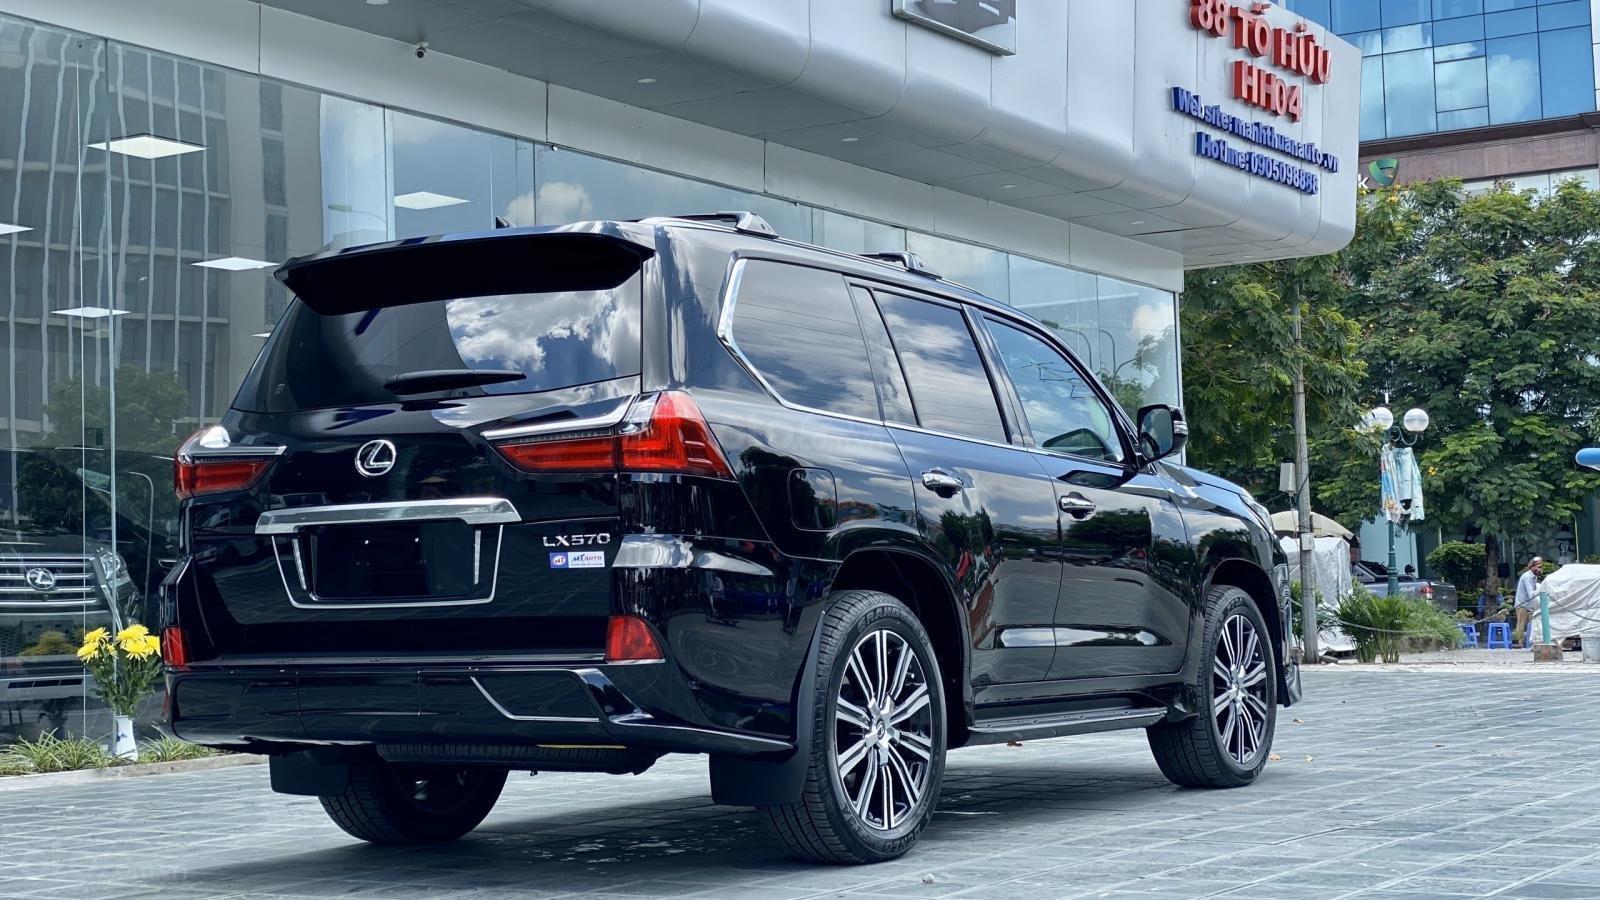 Bán Lexus LX 570s Supper Sport SX 2020, màu đen, xe nhập Mỹ mới 100% (5)